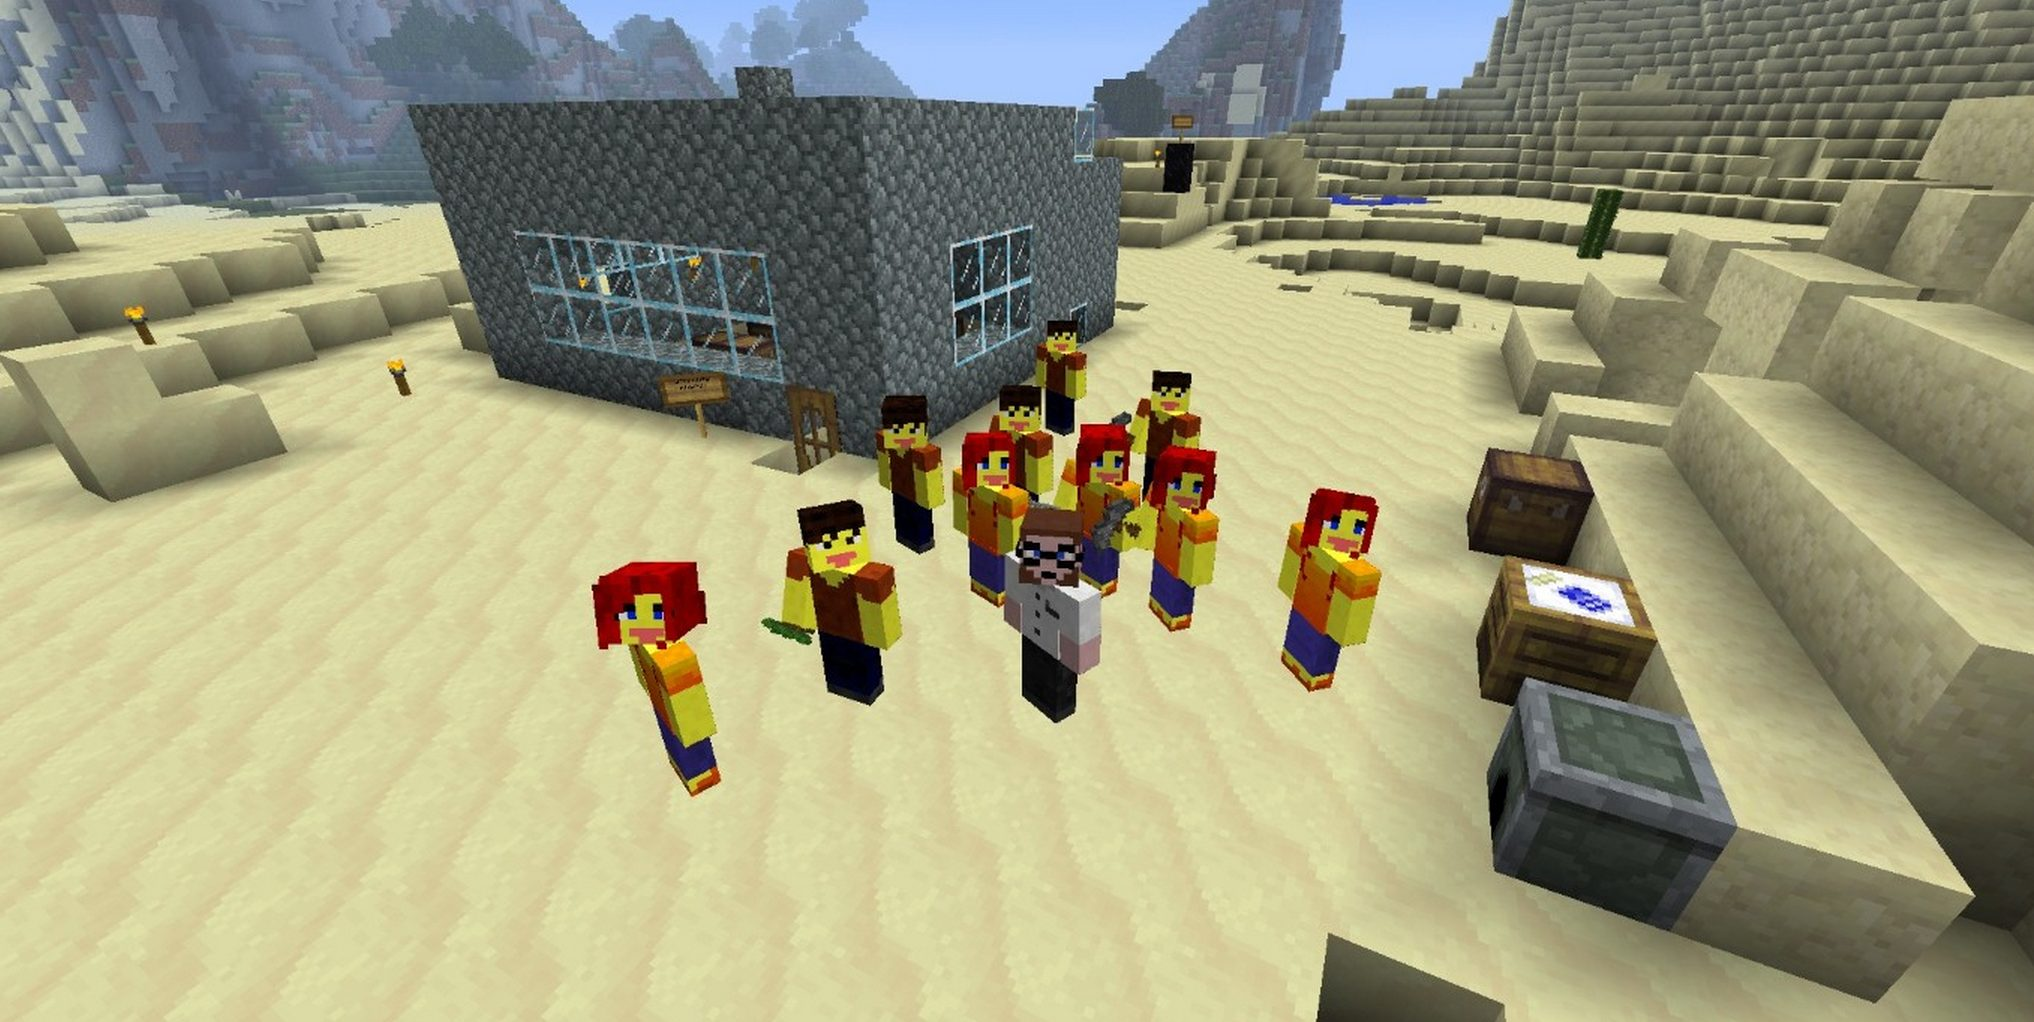 Class Photo in Minecraft.